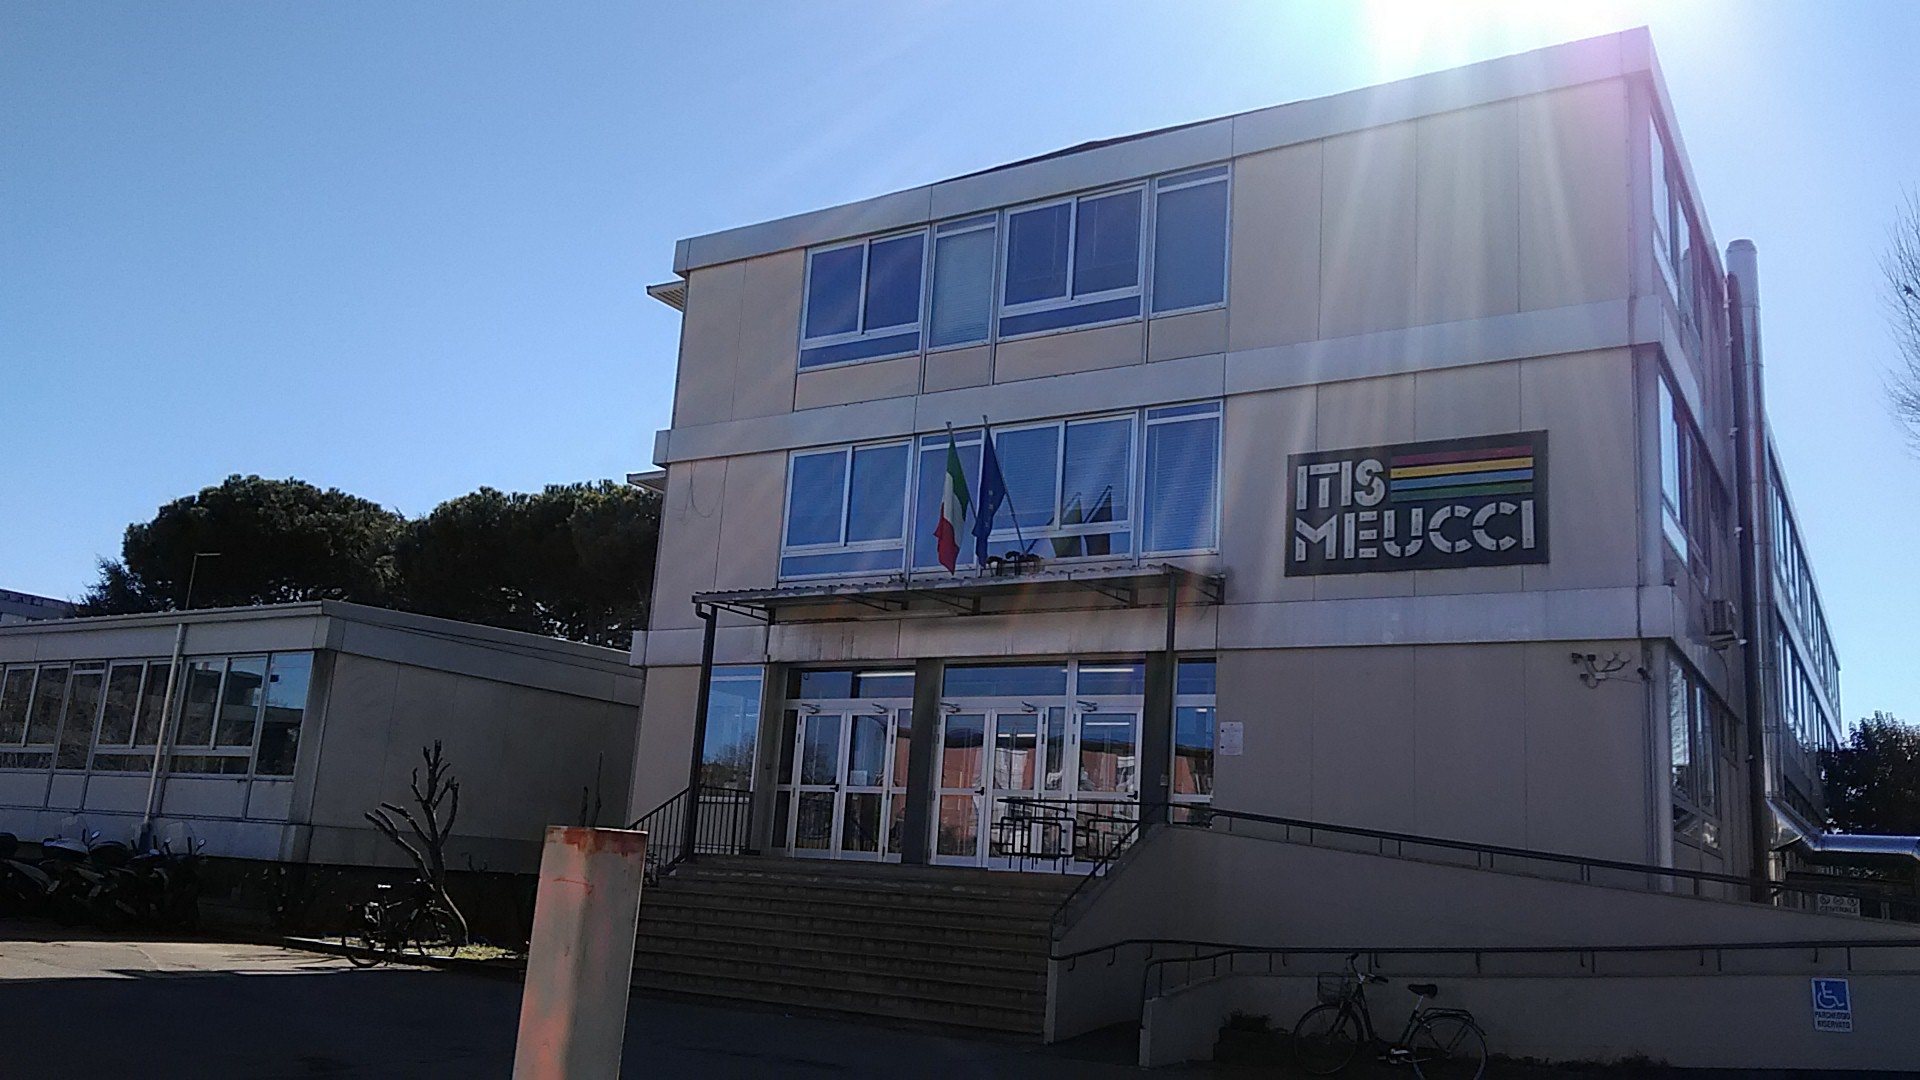 itis meucci 2019 (1)